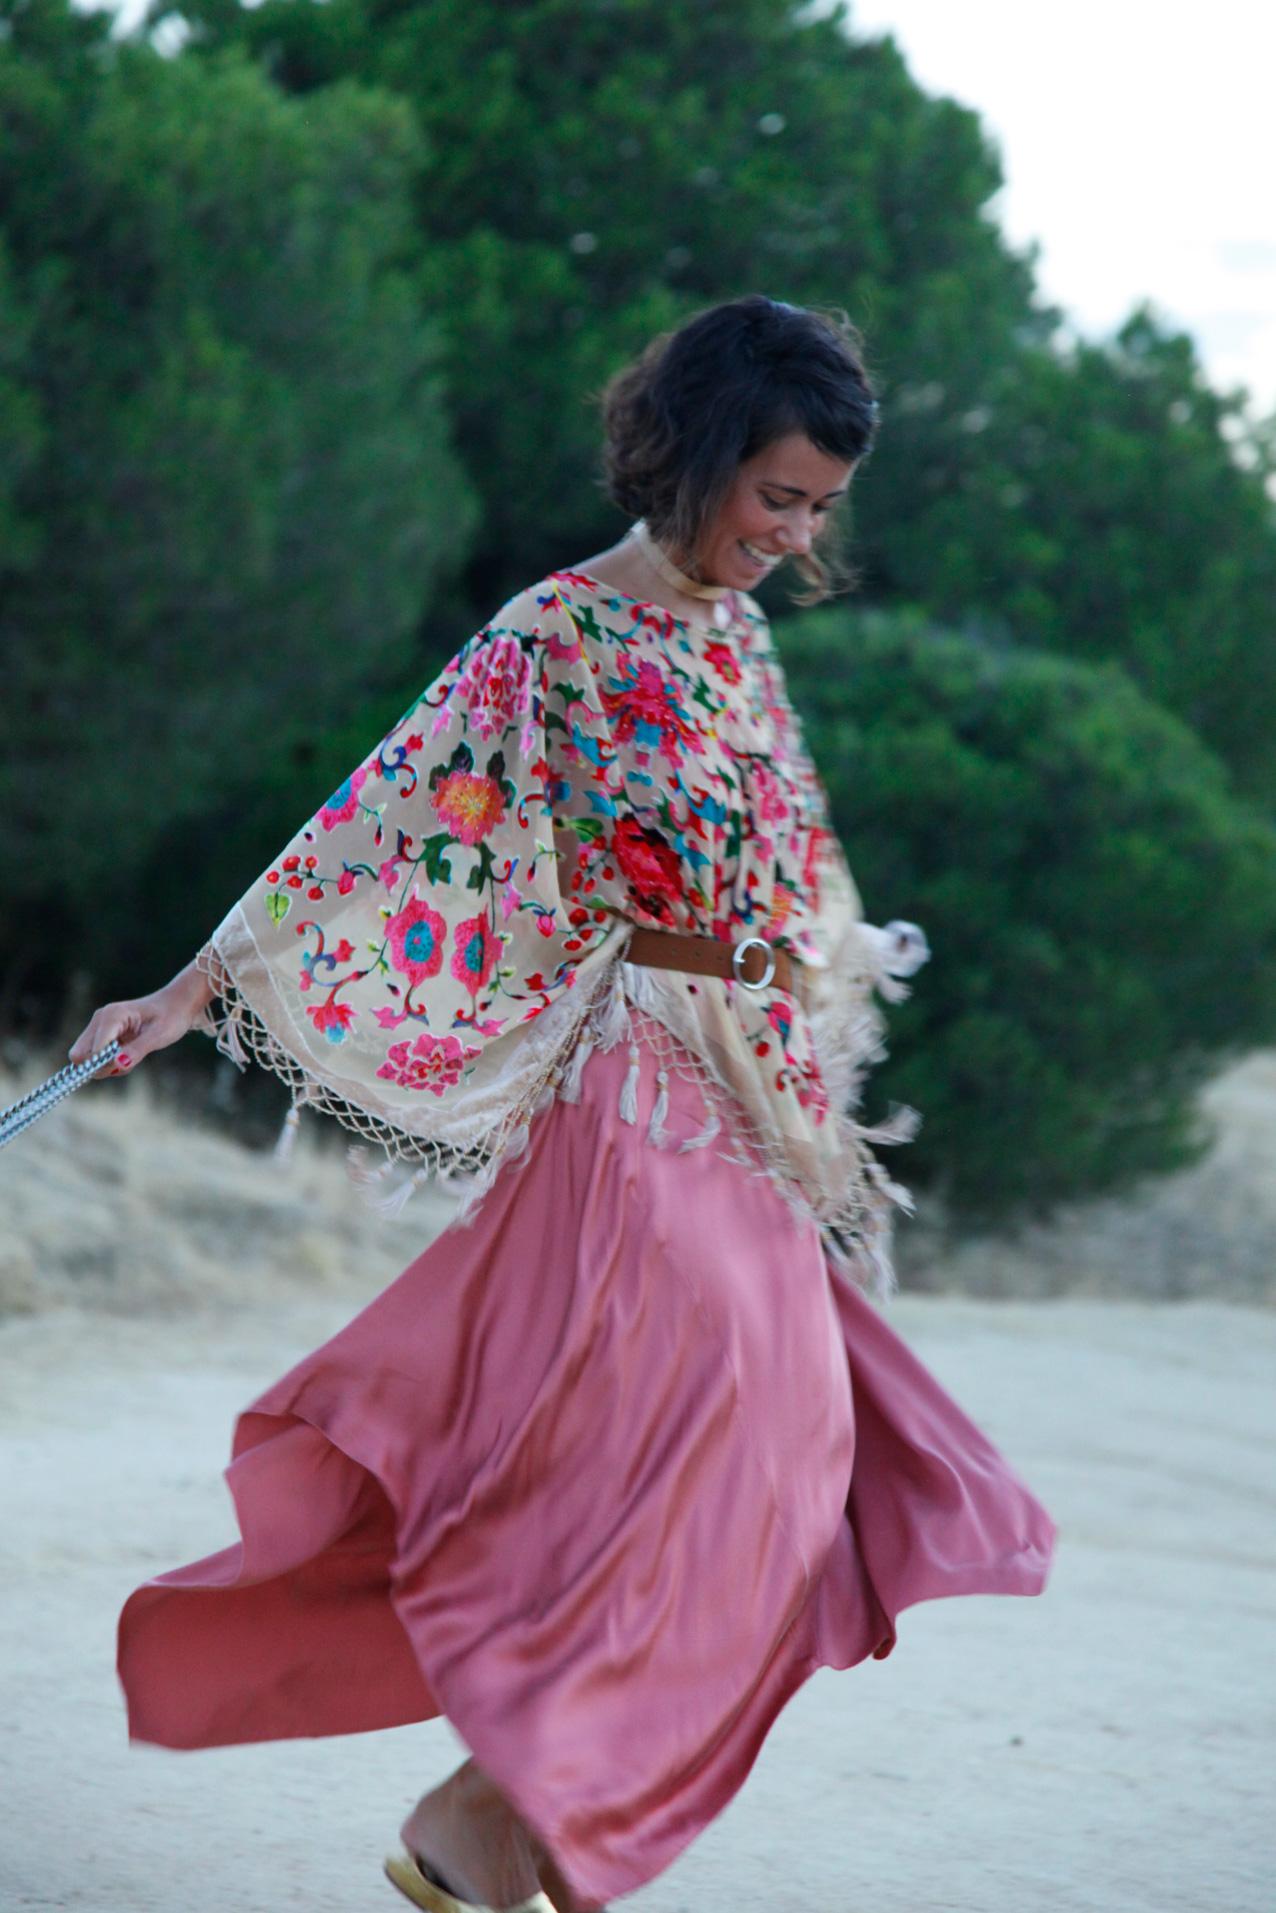 hippy_boho_dress-embroidered-cool_lemonade-strretstyle